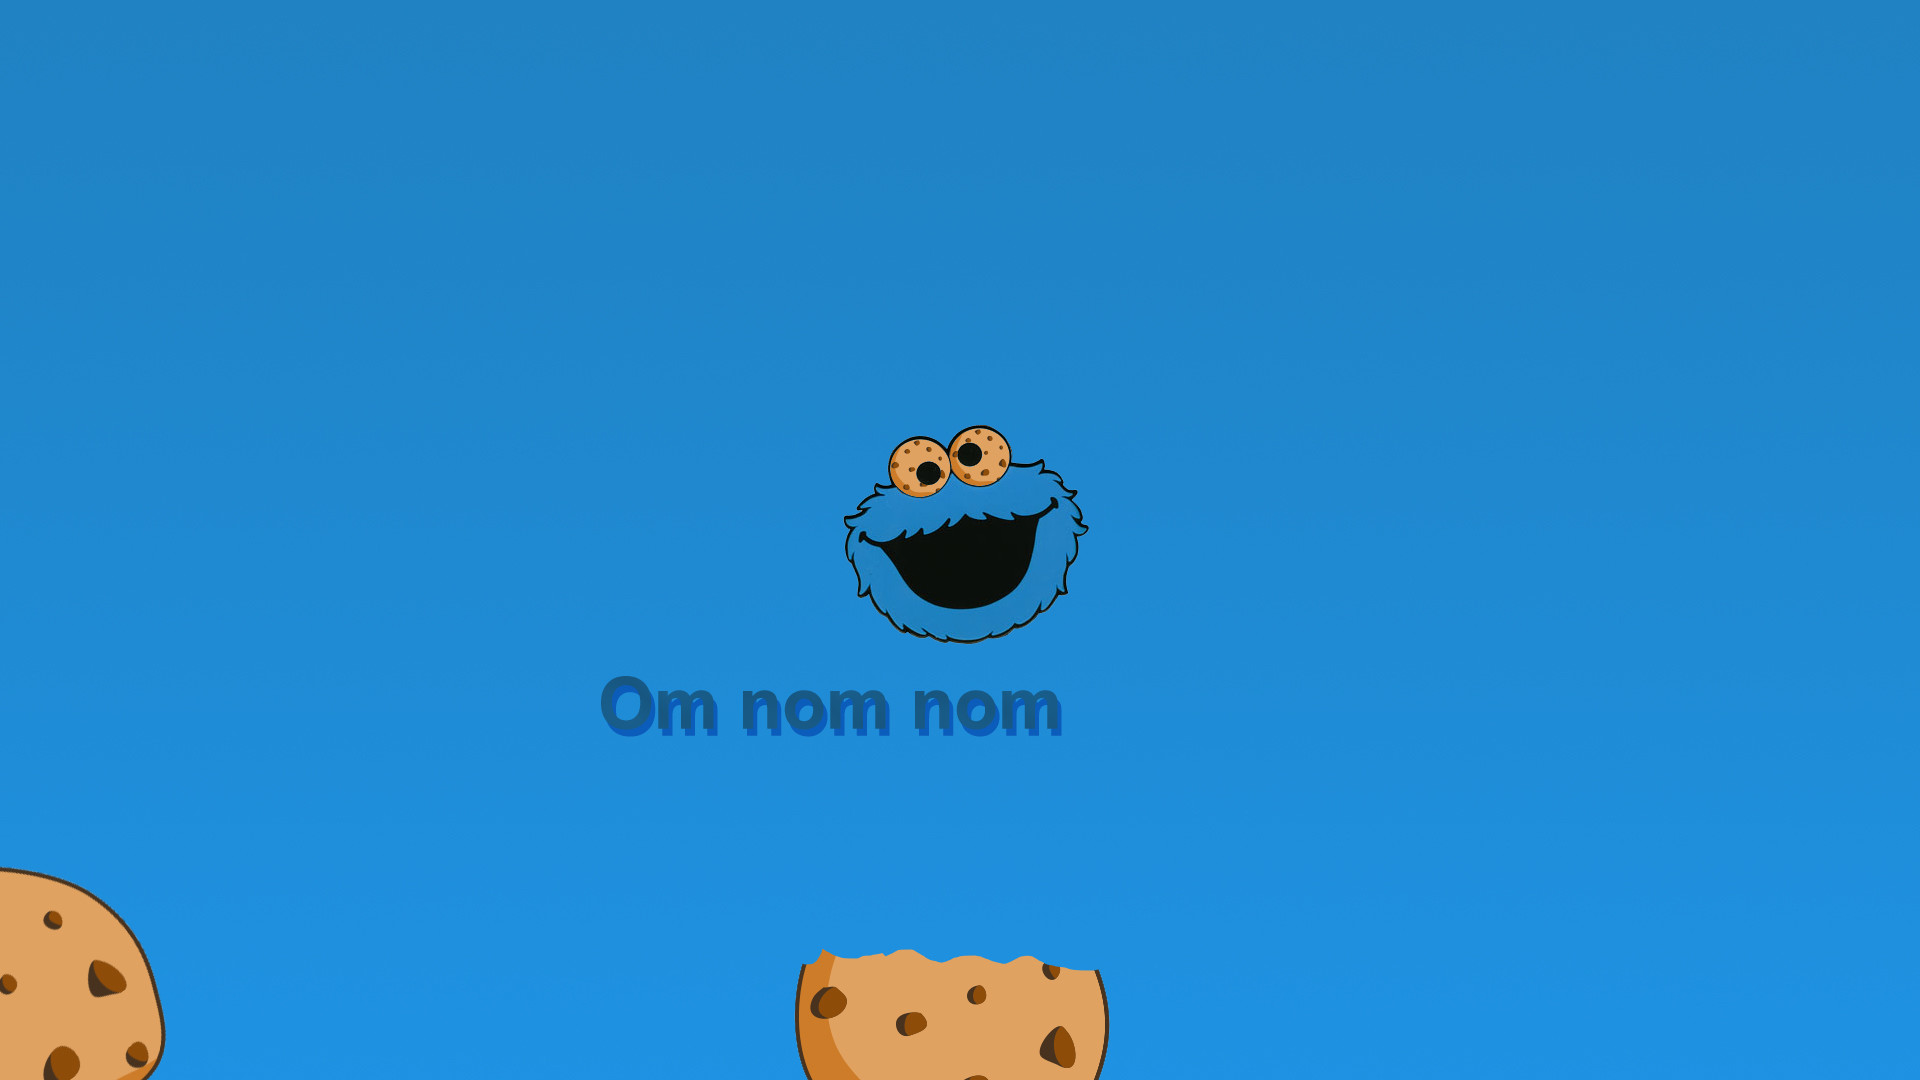 Cute Cookie Monster Wallpaper Wallpaper Elmo Tumblr 45 Images